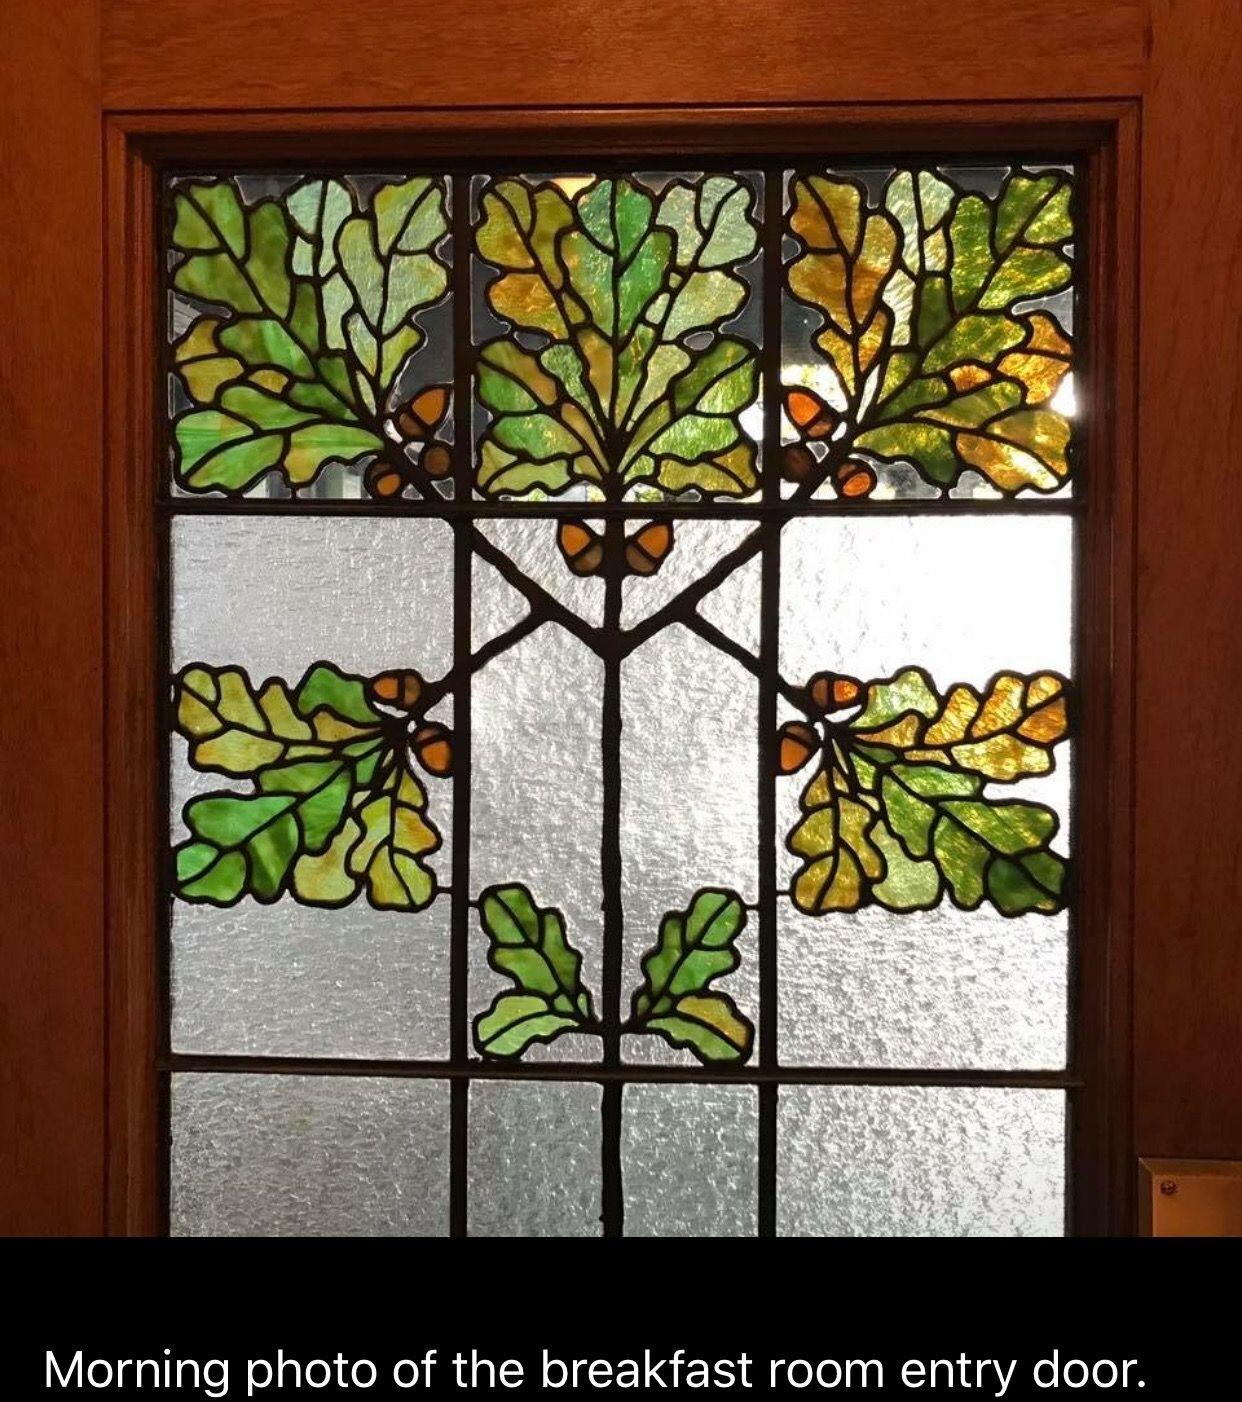 Pin By Sandy Dague On Glensheen Mansion Glensheen Glensheen Mansion Stained Glass Art